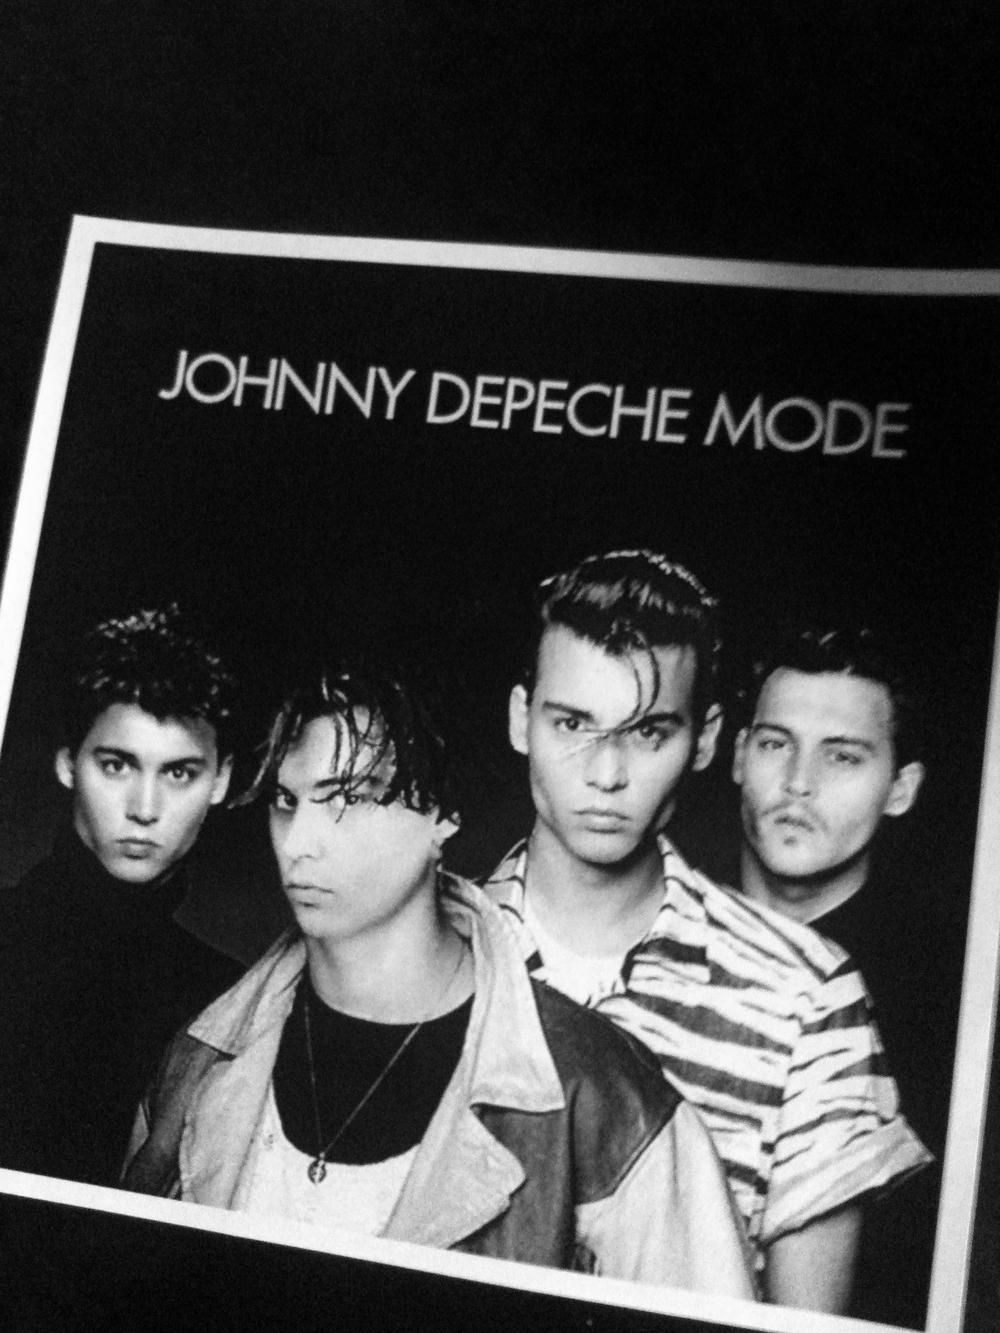 Johnny_Depeche_Mode_JustinHarder.png